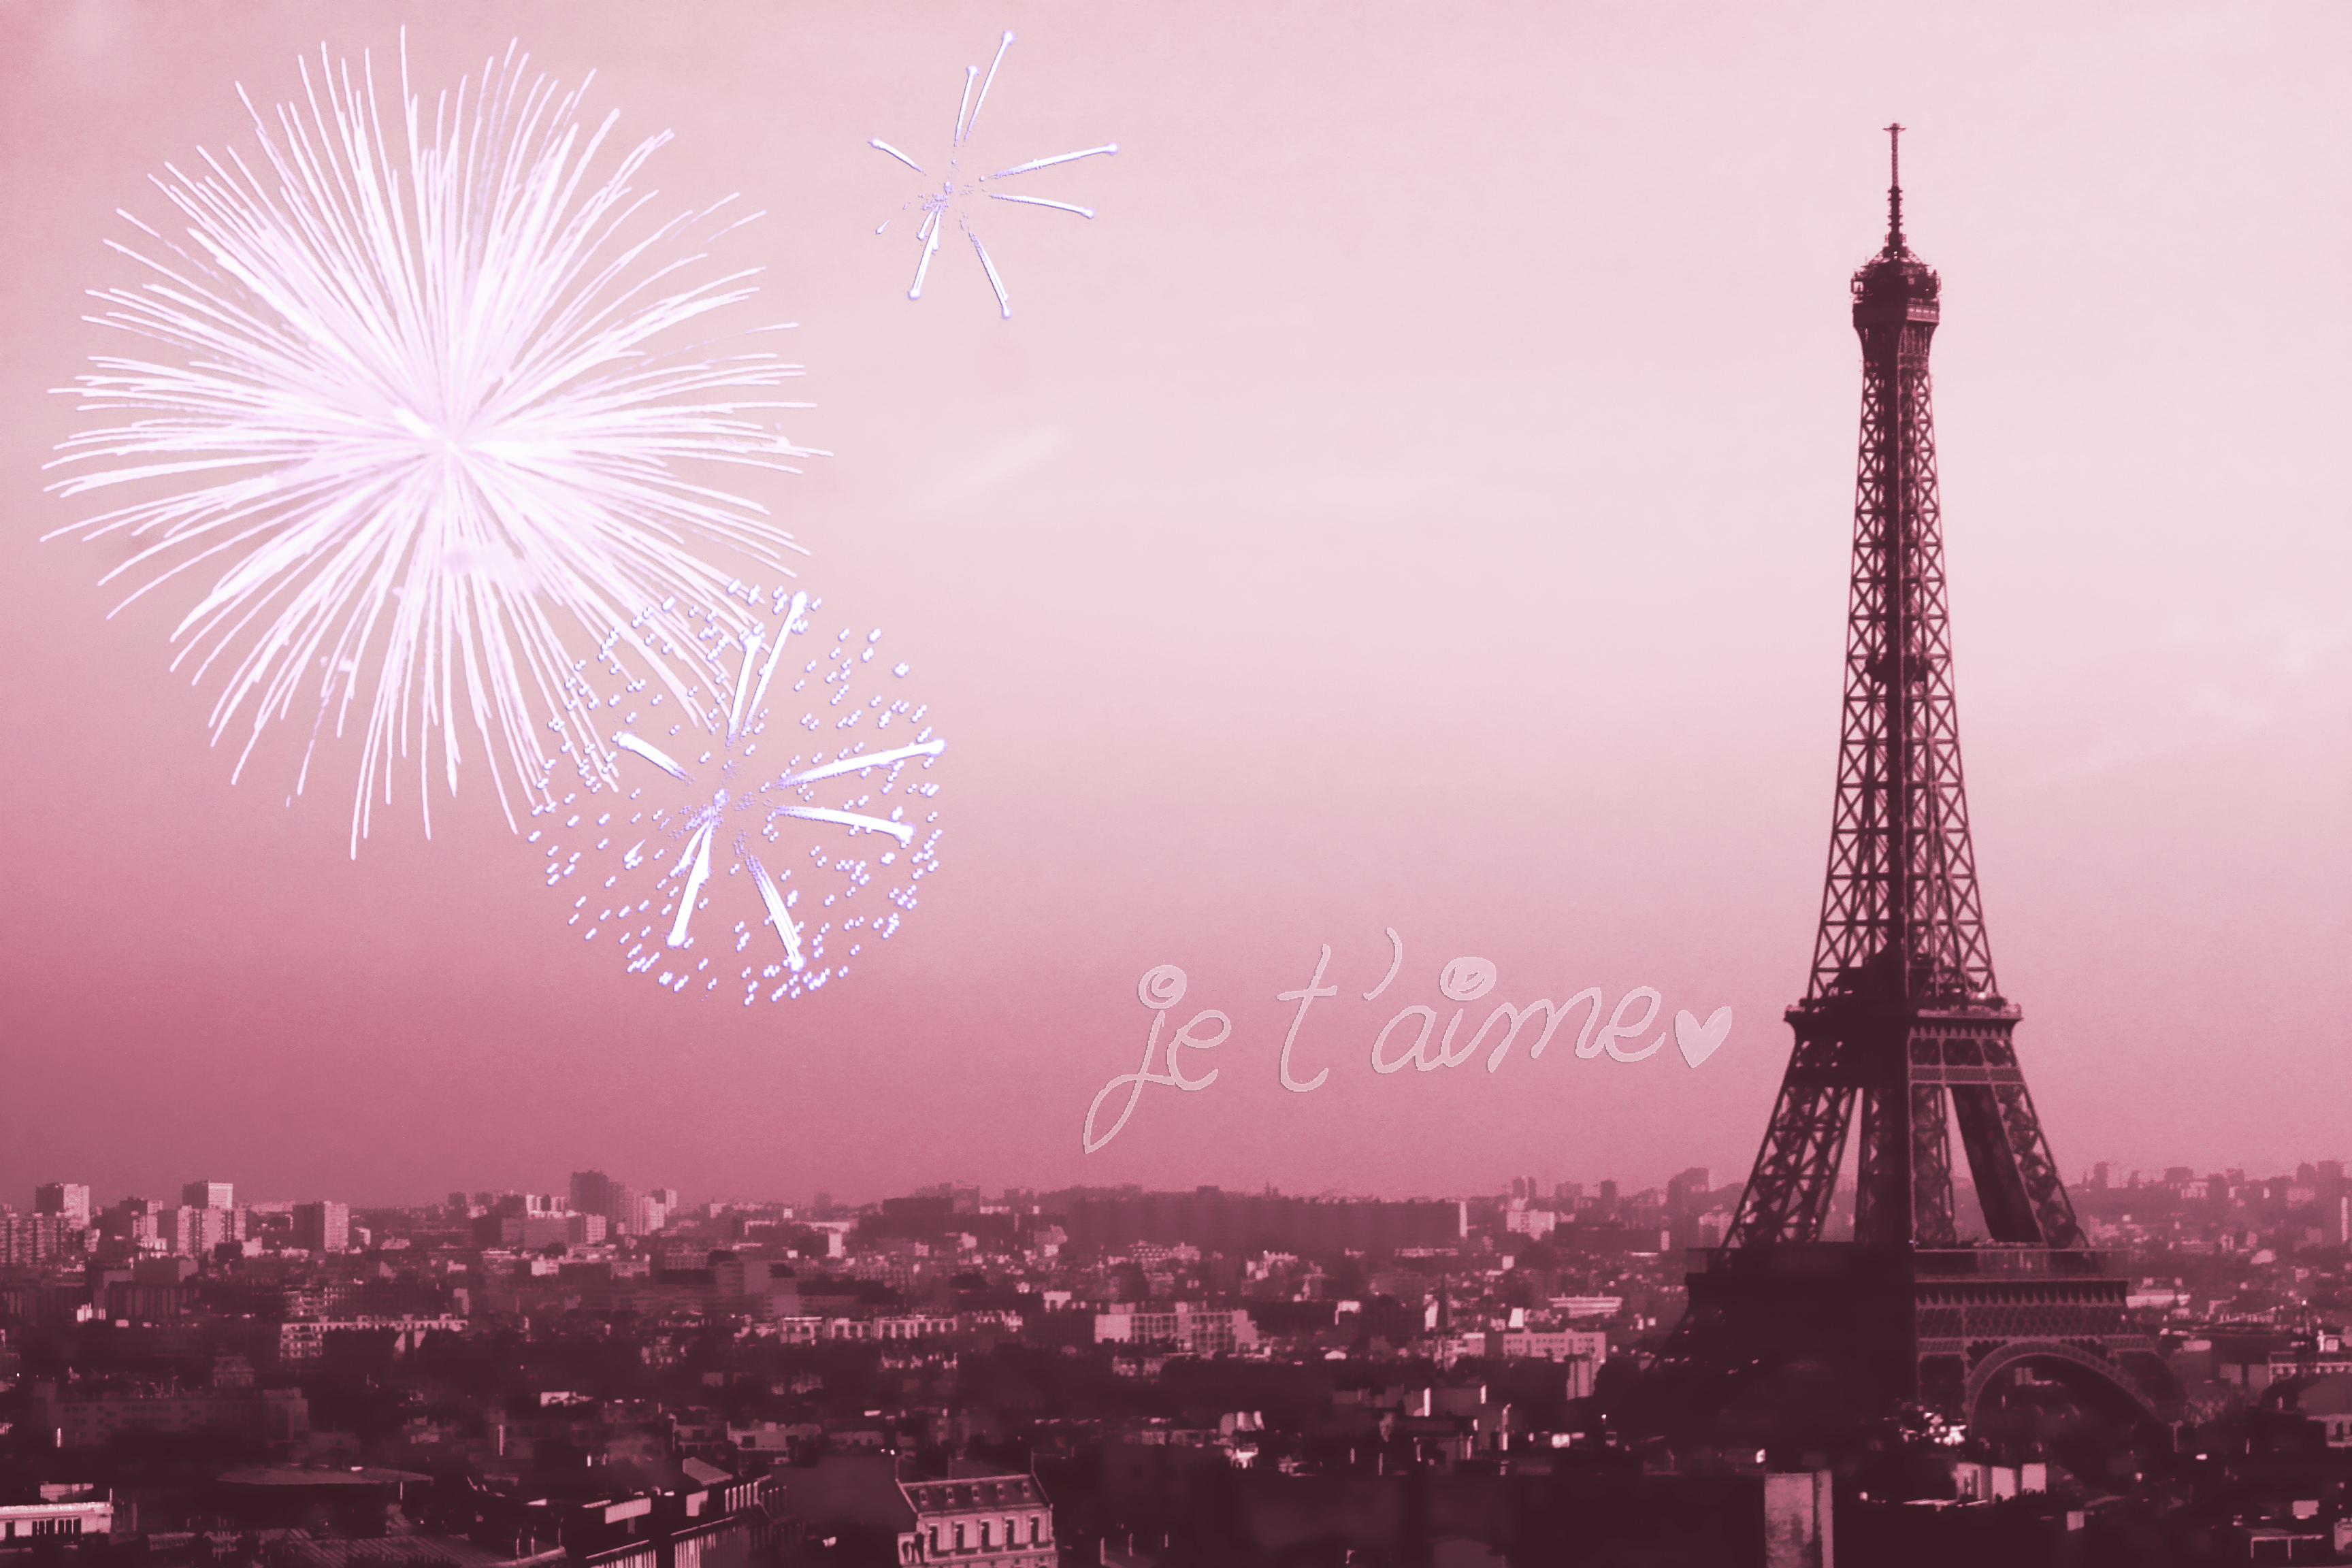 1200x1600 Wallpaper Hd: Cute Eiffel Tower Wallpapers